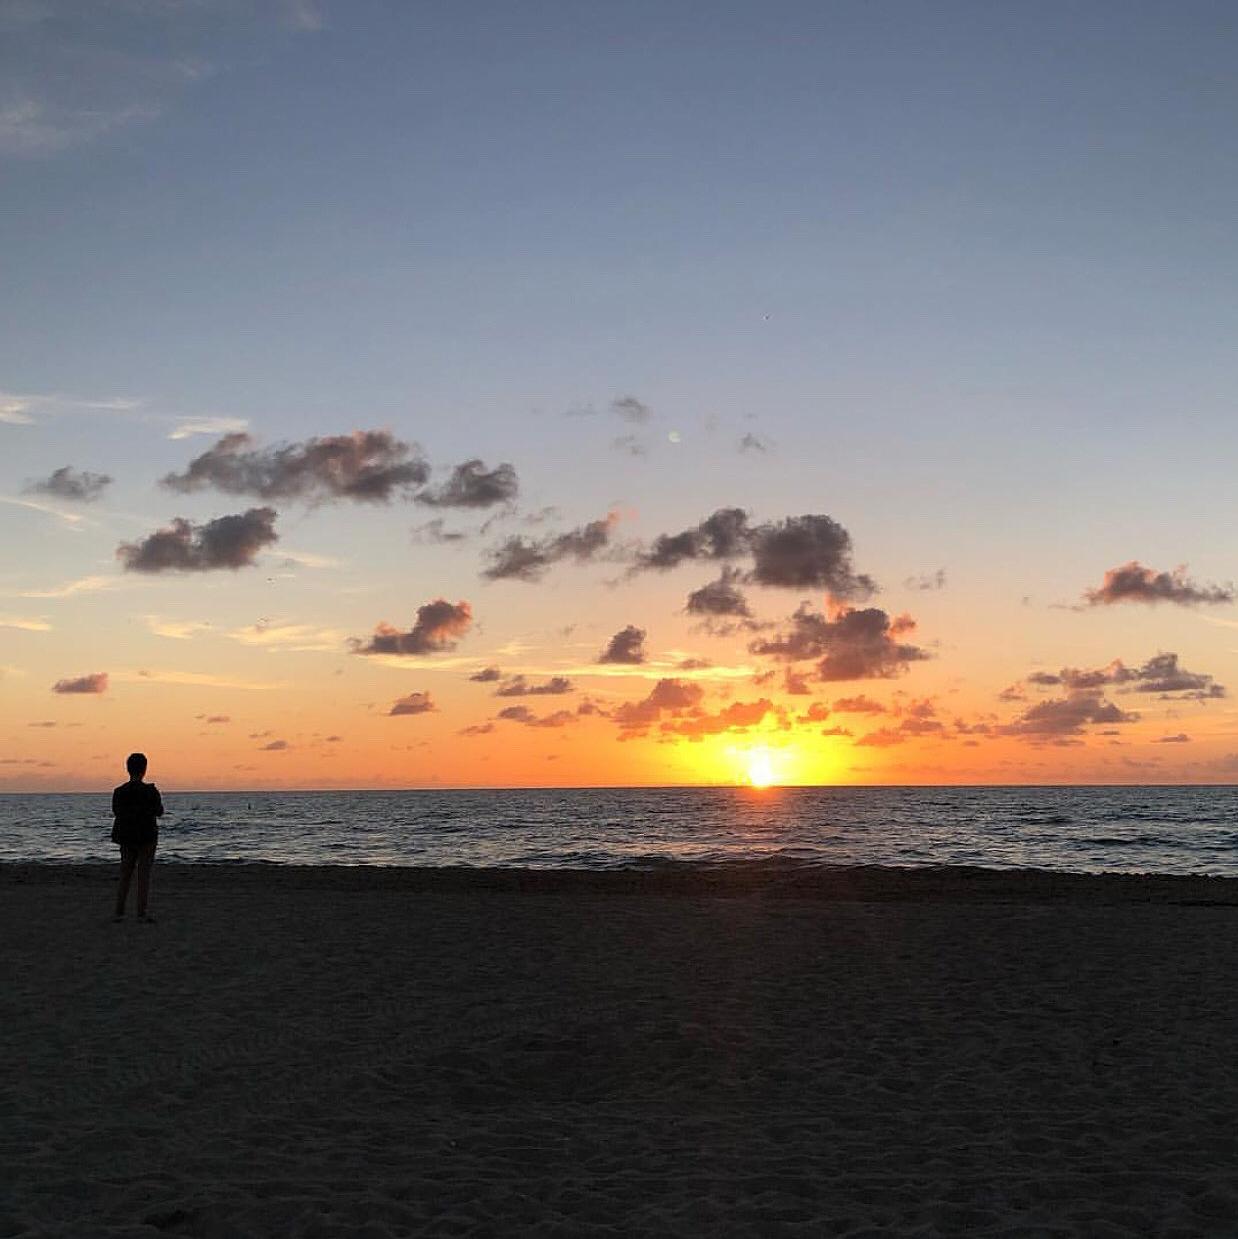 Katie_kerl_Miami_sunset_spring_2019